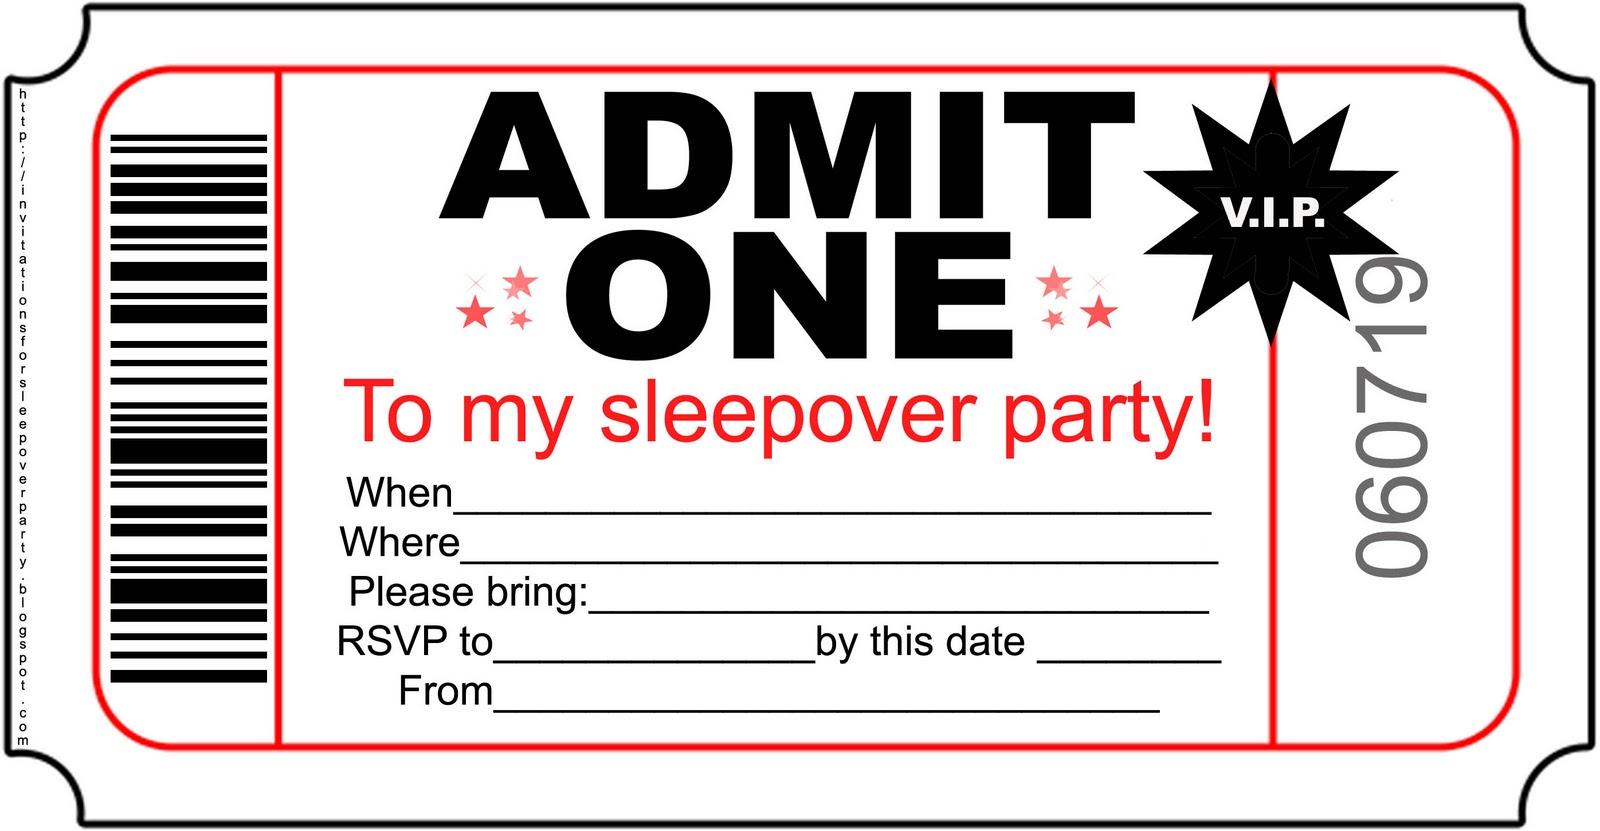 Pajama Invitations is awesome invitations design